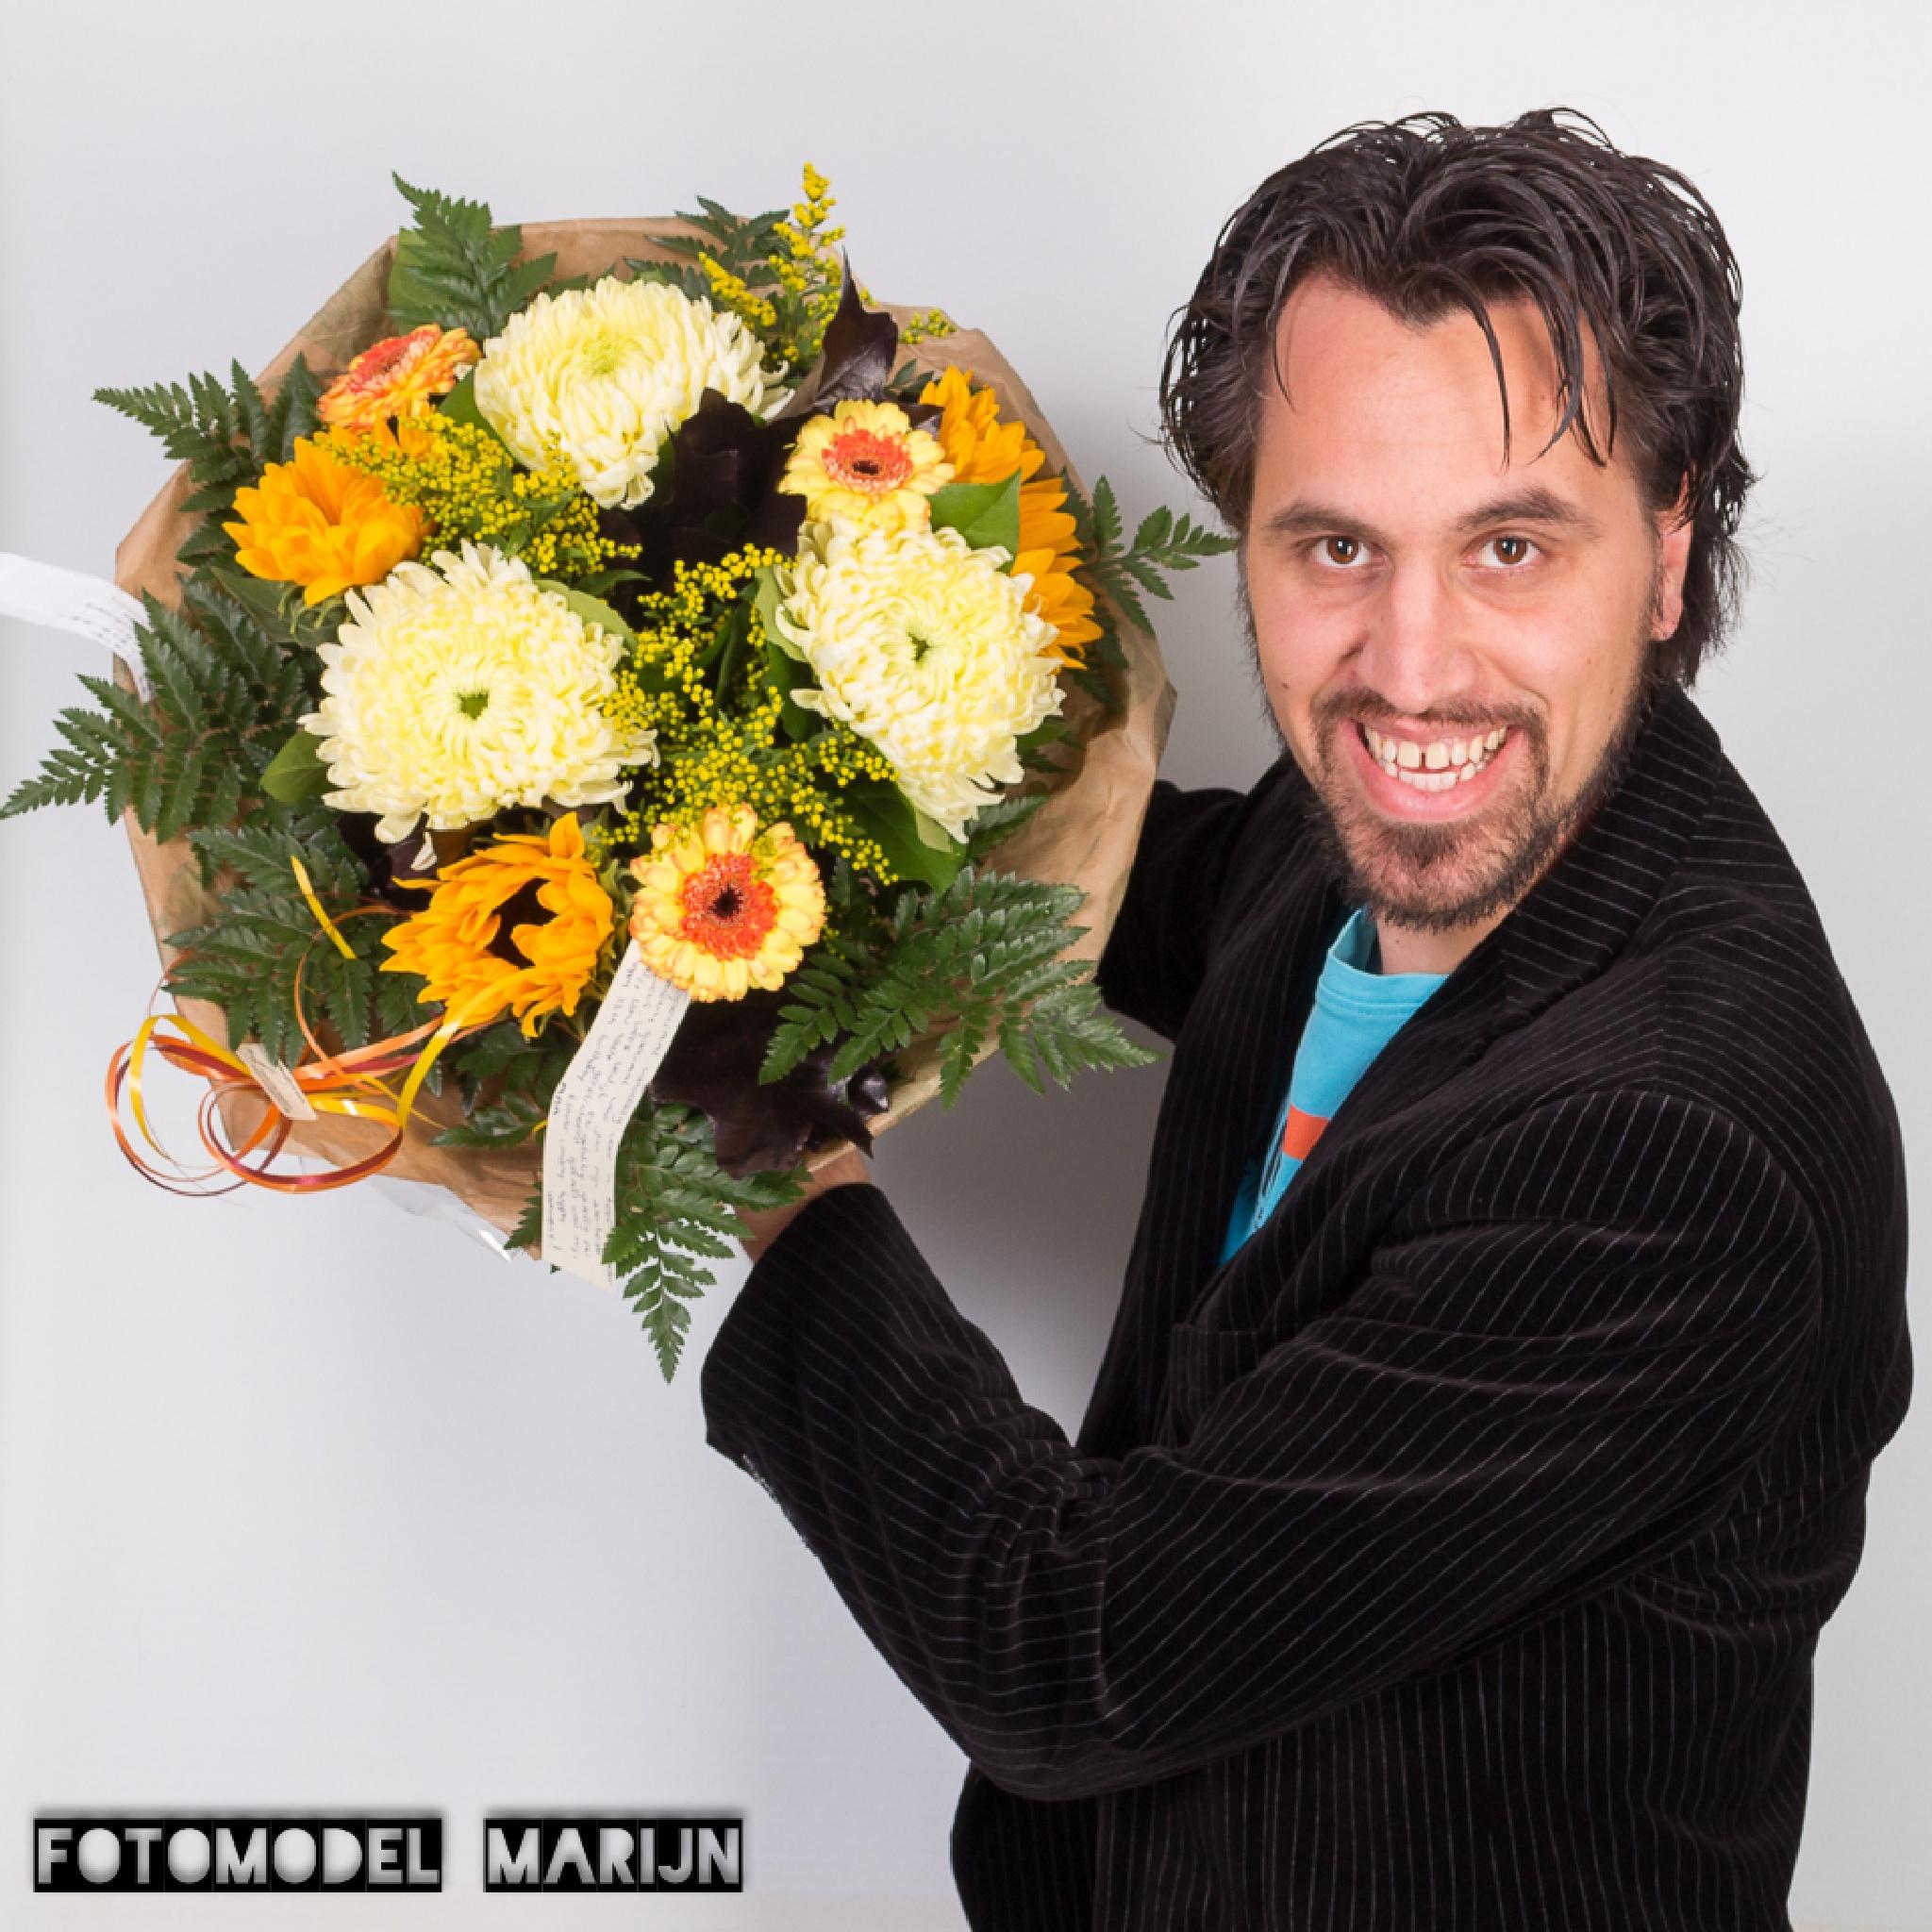 It's my birthday by EMR Photography & Fotomodel Marijn